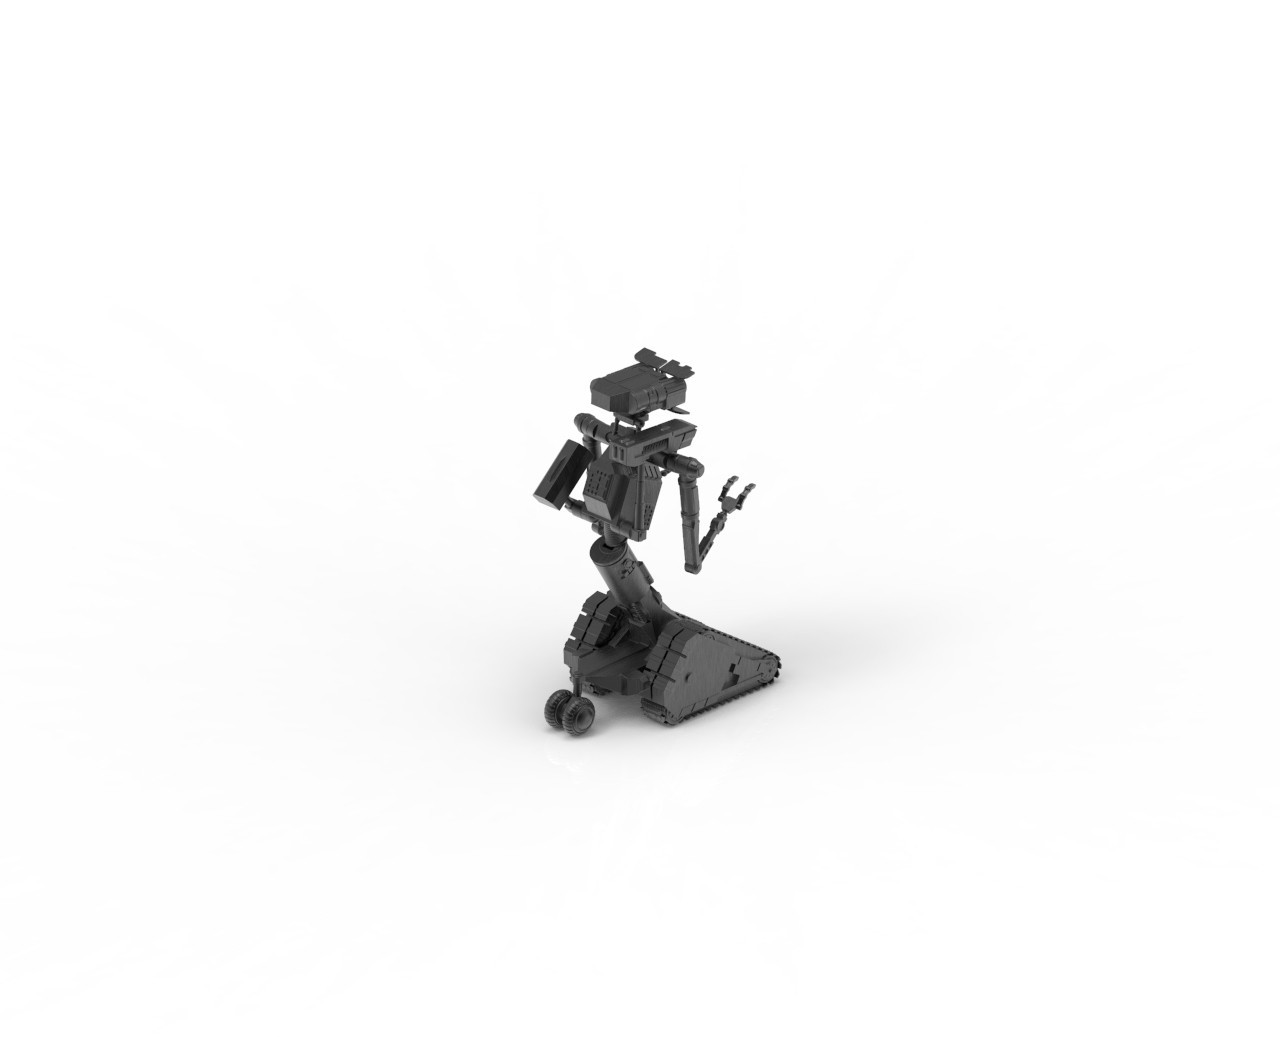 untitled.9.jpg Download STL file Johnny 5 - 3D print model • 3D printable template, 3D-mon